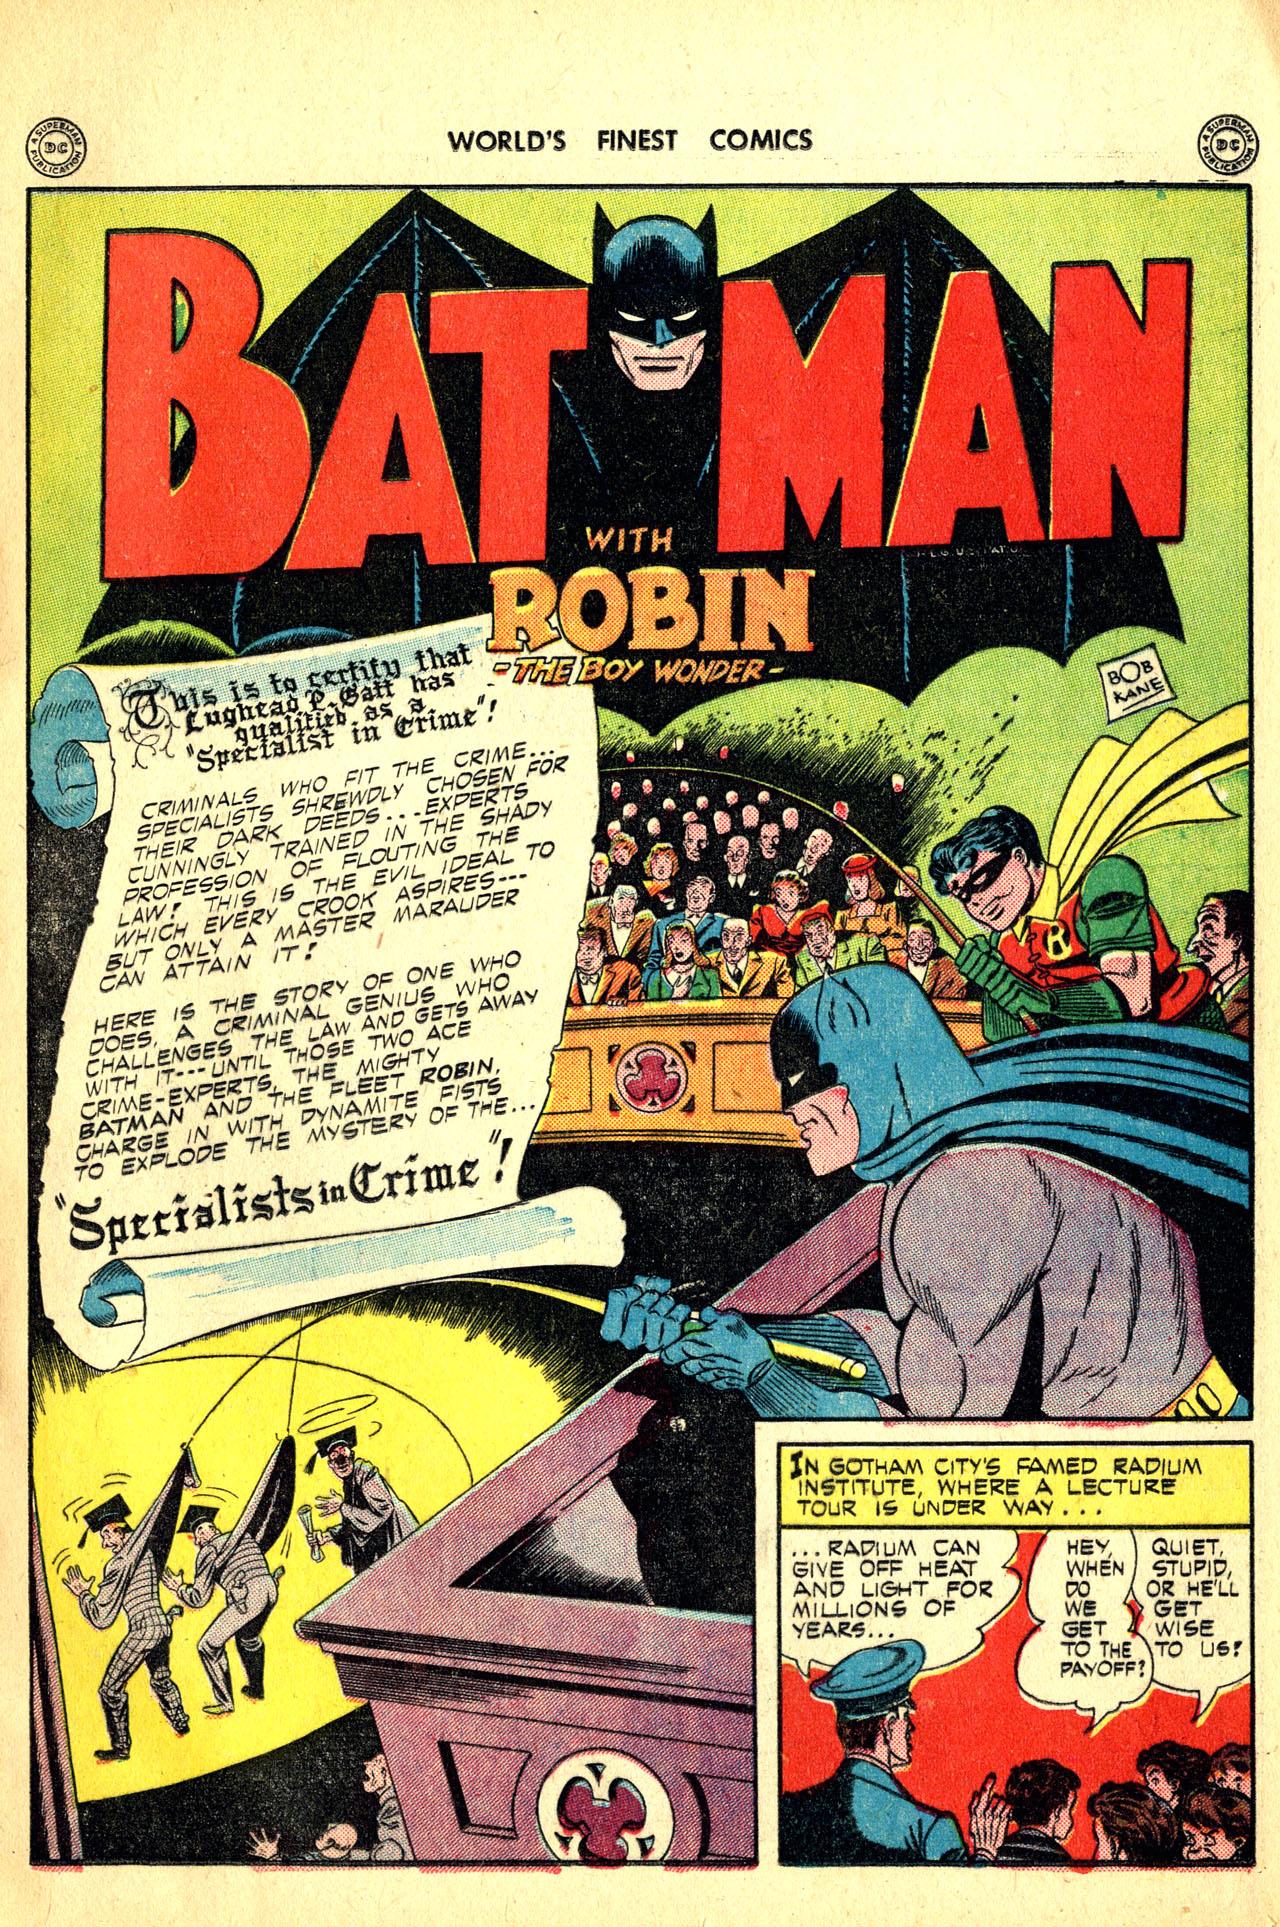 Read online World's Finest Comics comic -  Issue #18 - 69